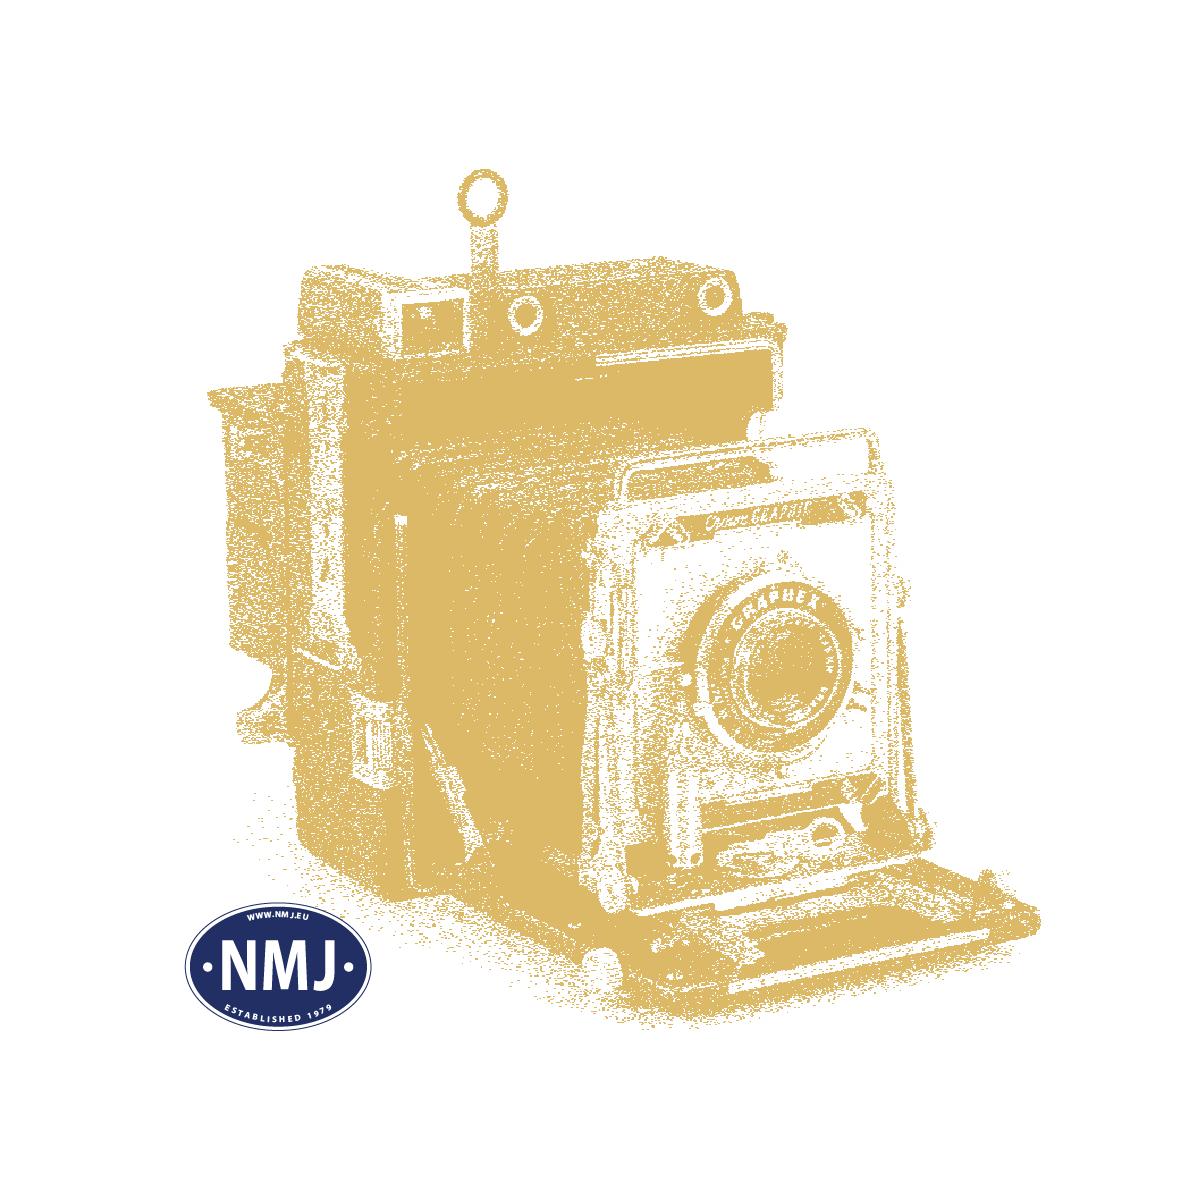 NMJT84.203 - NMJ Topline NSB BM69A.006, rot/schwarz, DC